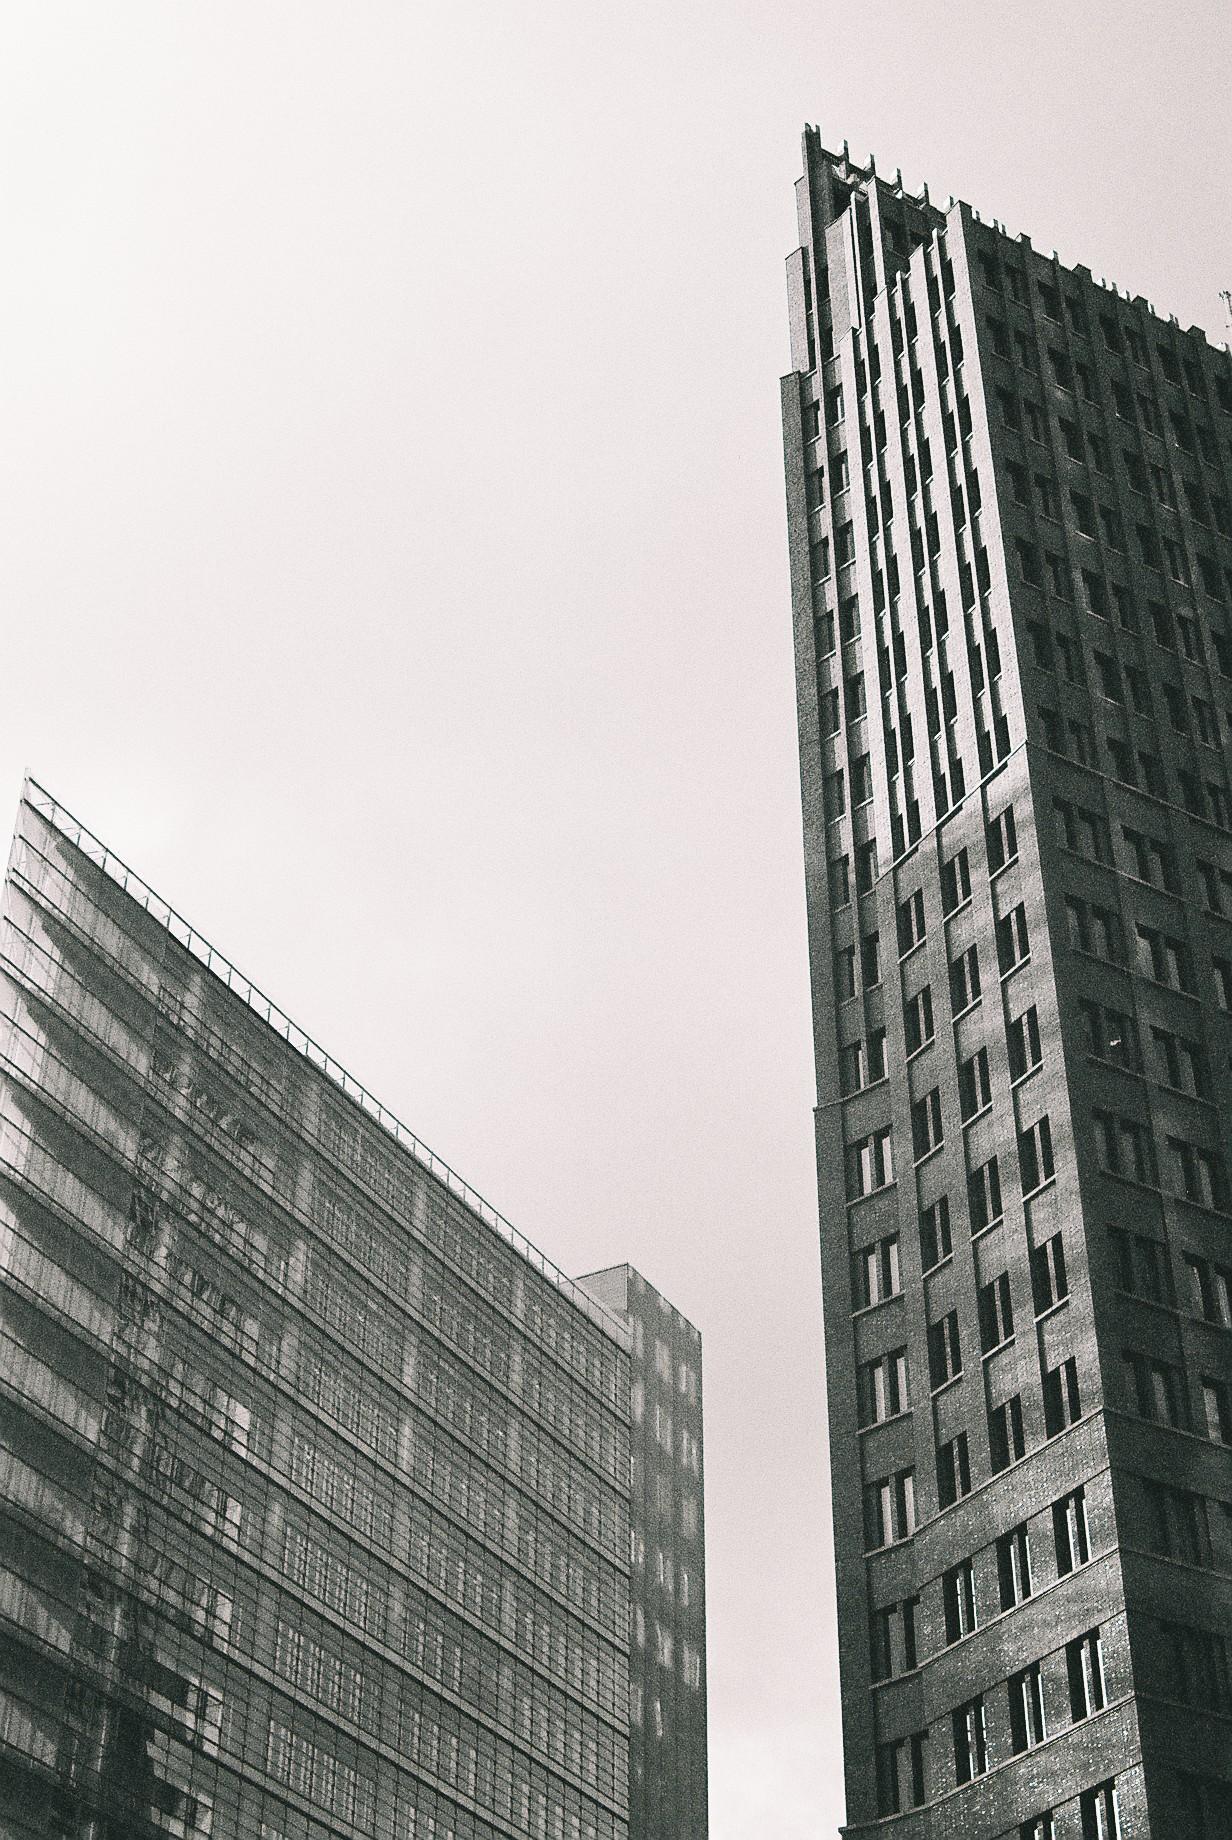 Fred+Howarth+Photography_Berlin_Kolhoff_35mm.JPG